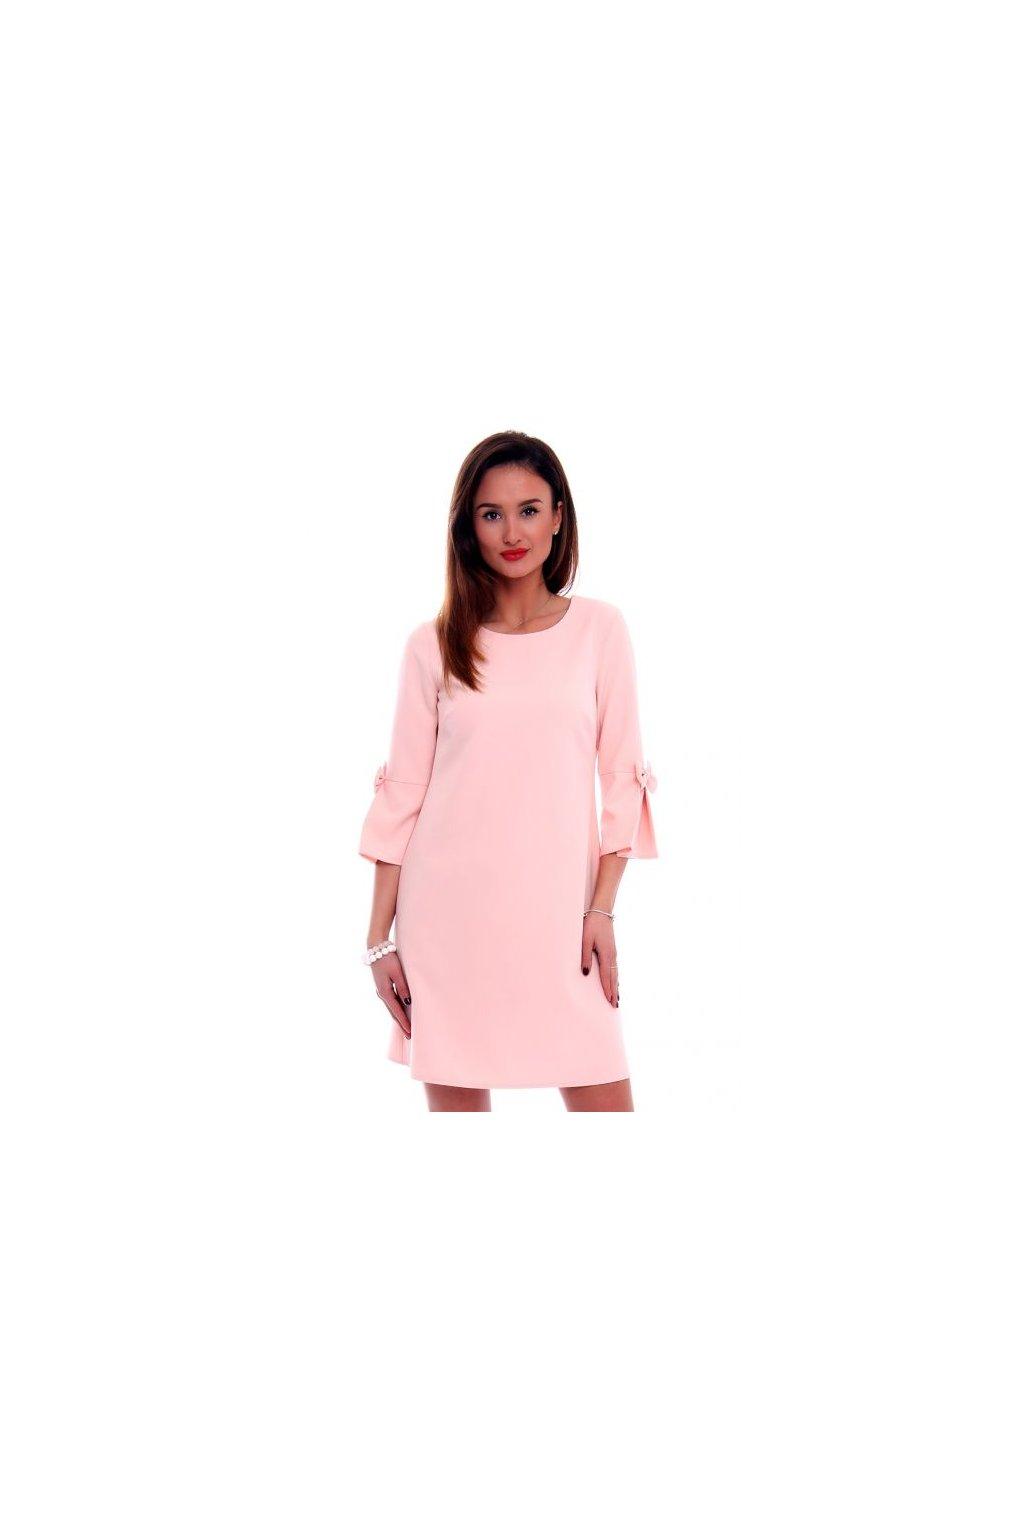 Koktejlové šaty s mašľou CMK409 ružové - Tentation.sk 876ca50513